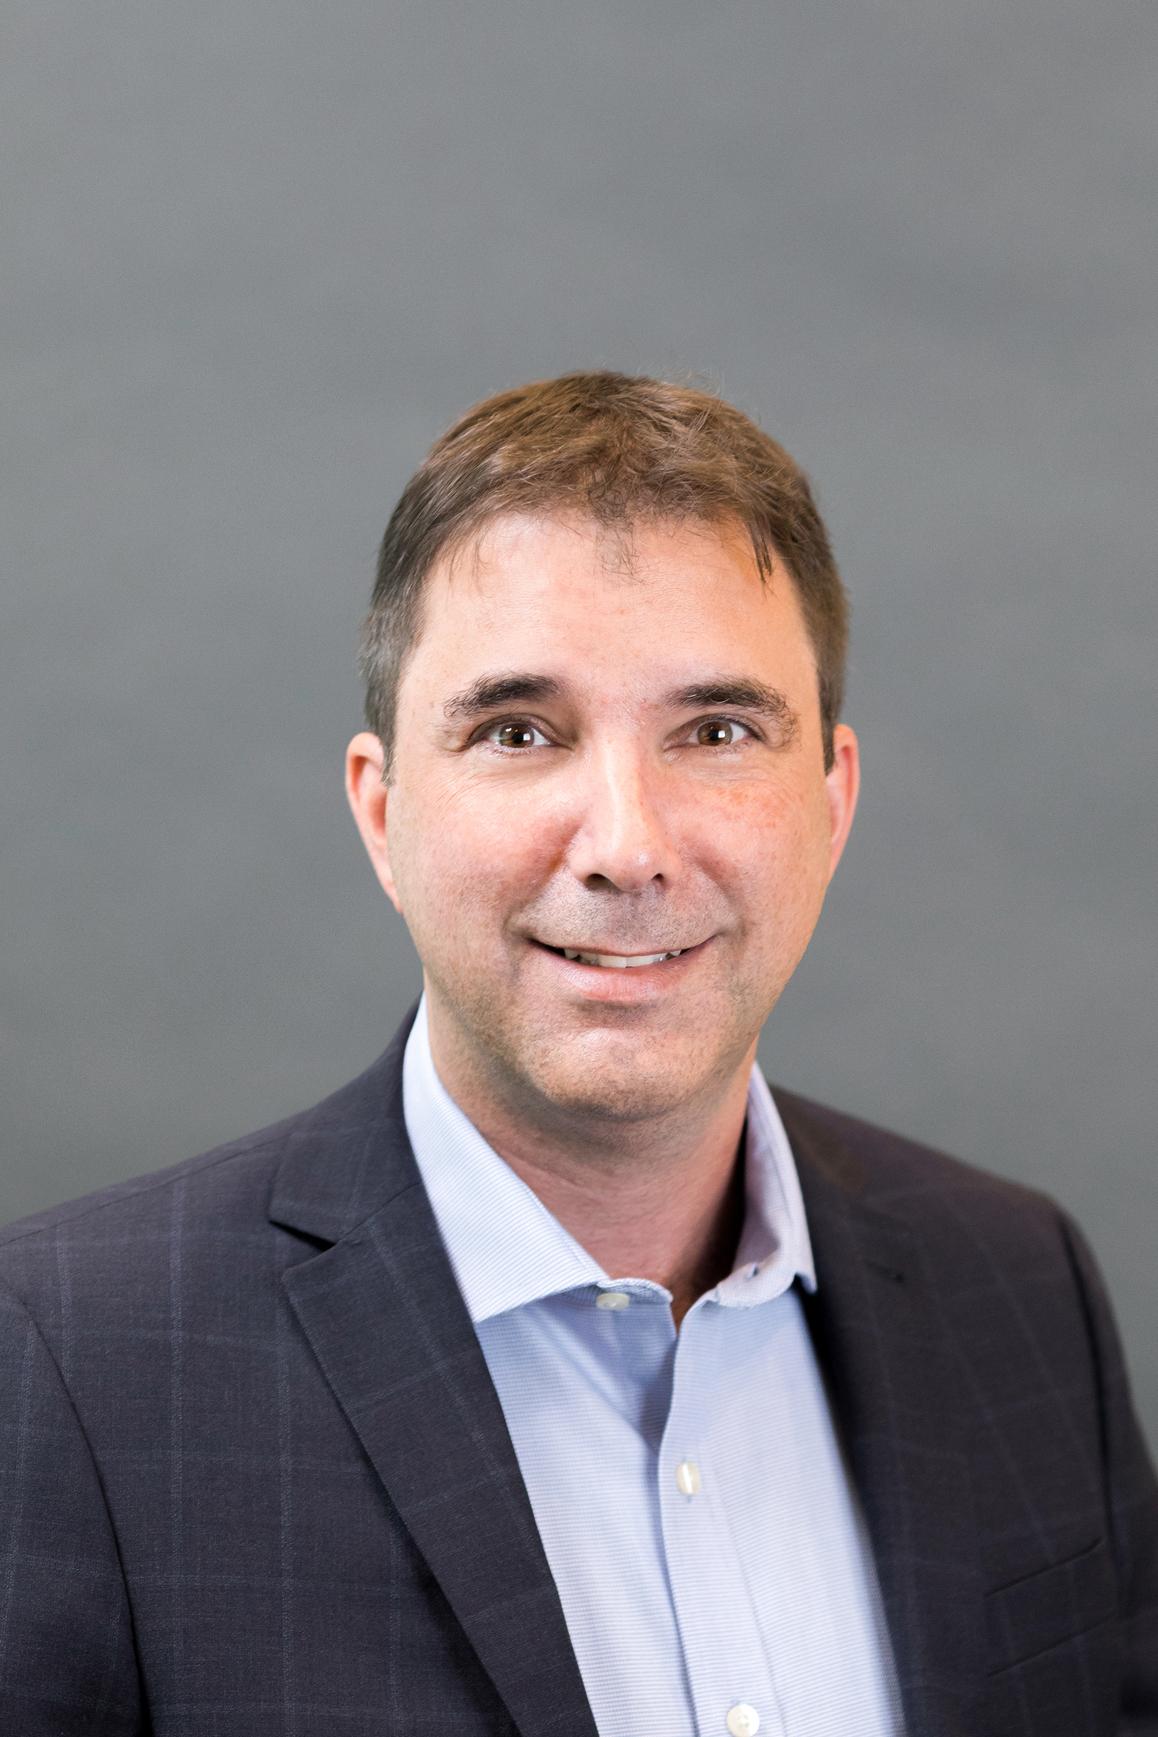 Jeffrey Ambrose